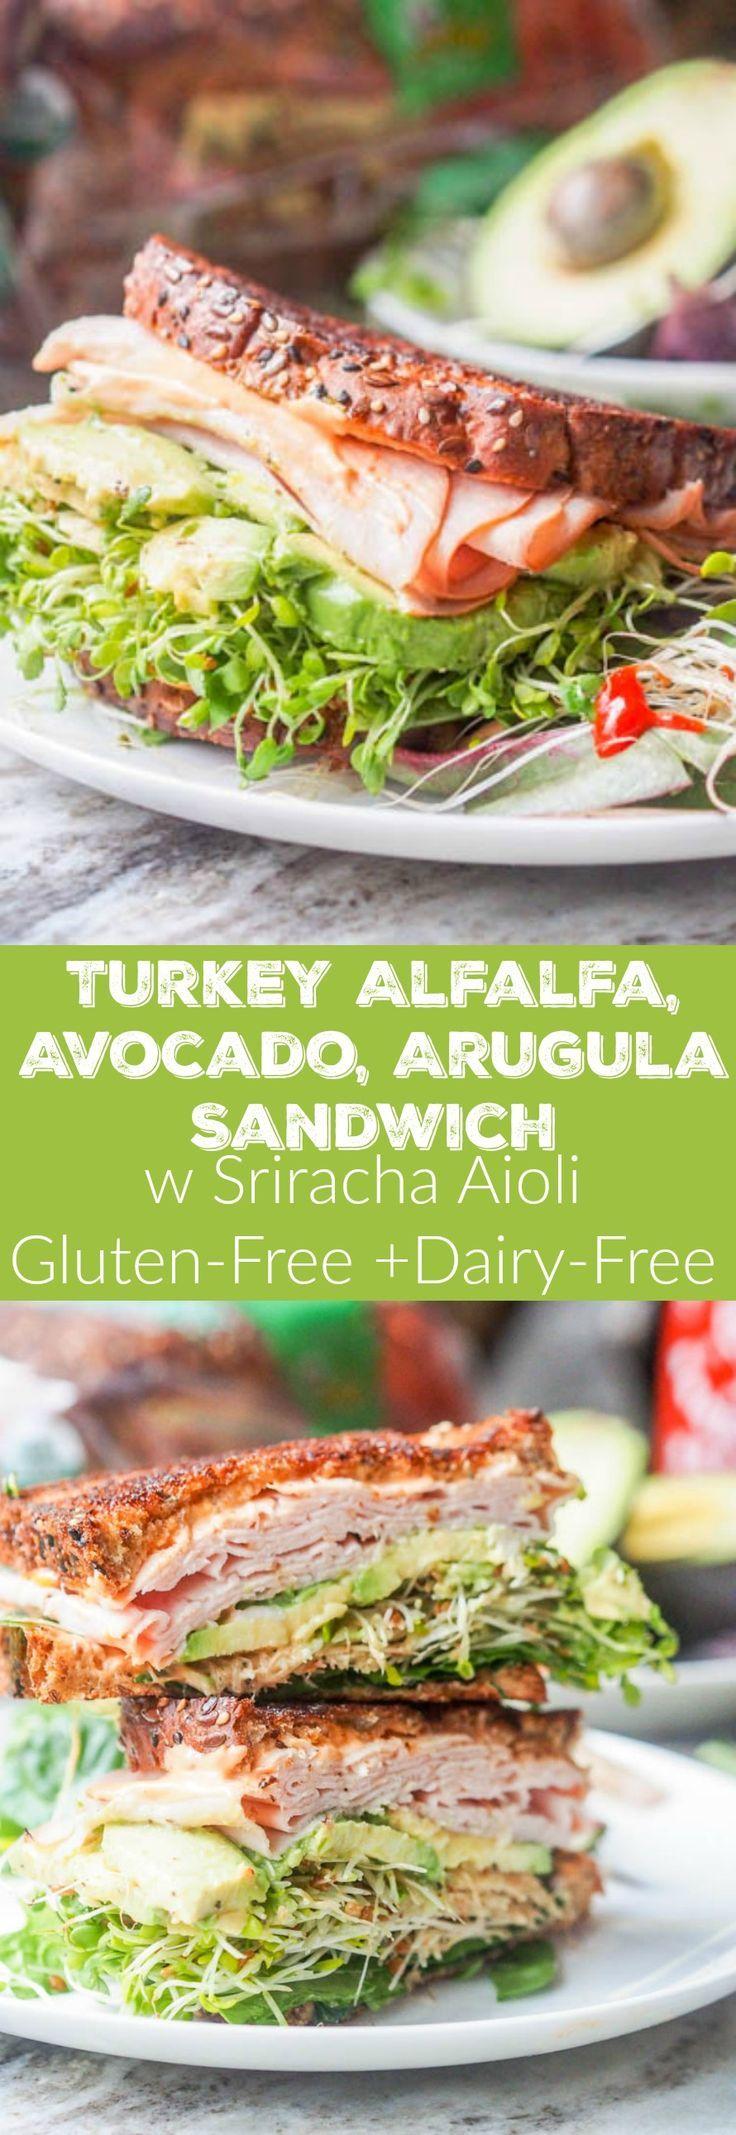 The best turkey, arugula, alfalfa and avocado sandwich you'll ever eat. Topped with a spicy Sriracha Aioli. Boom. Lunch is served. Gluten Free + Dairy Free too.  avocadopesto.com #OscarMayerNatural #sponsored #sandwich #lunch #avocado